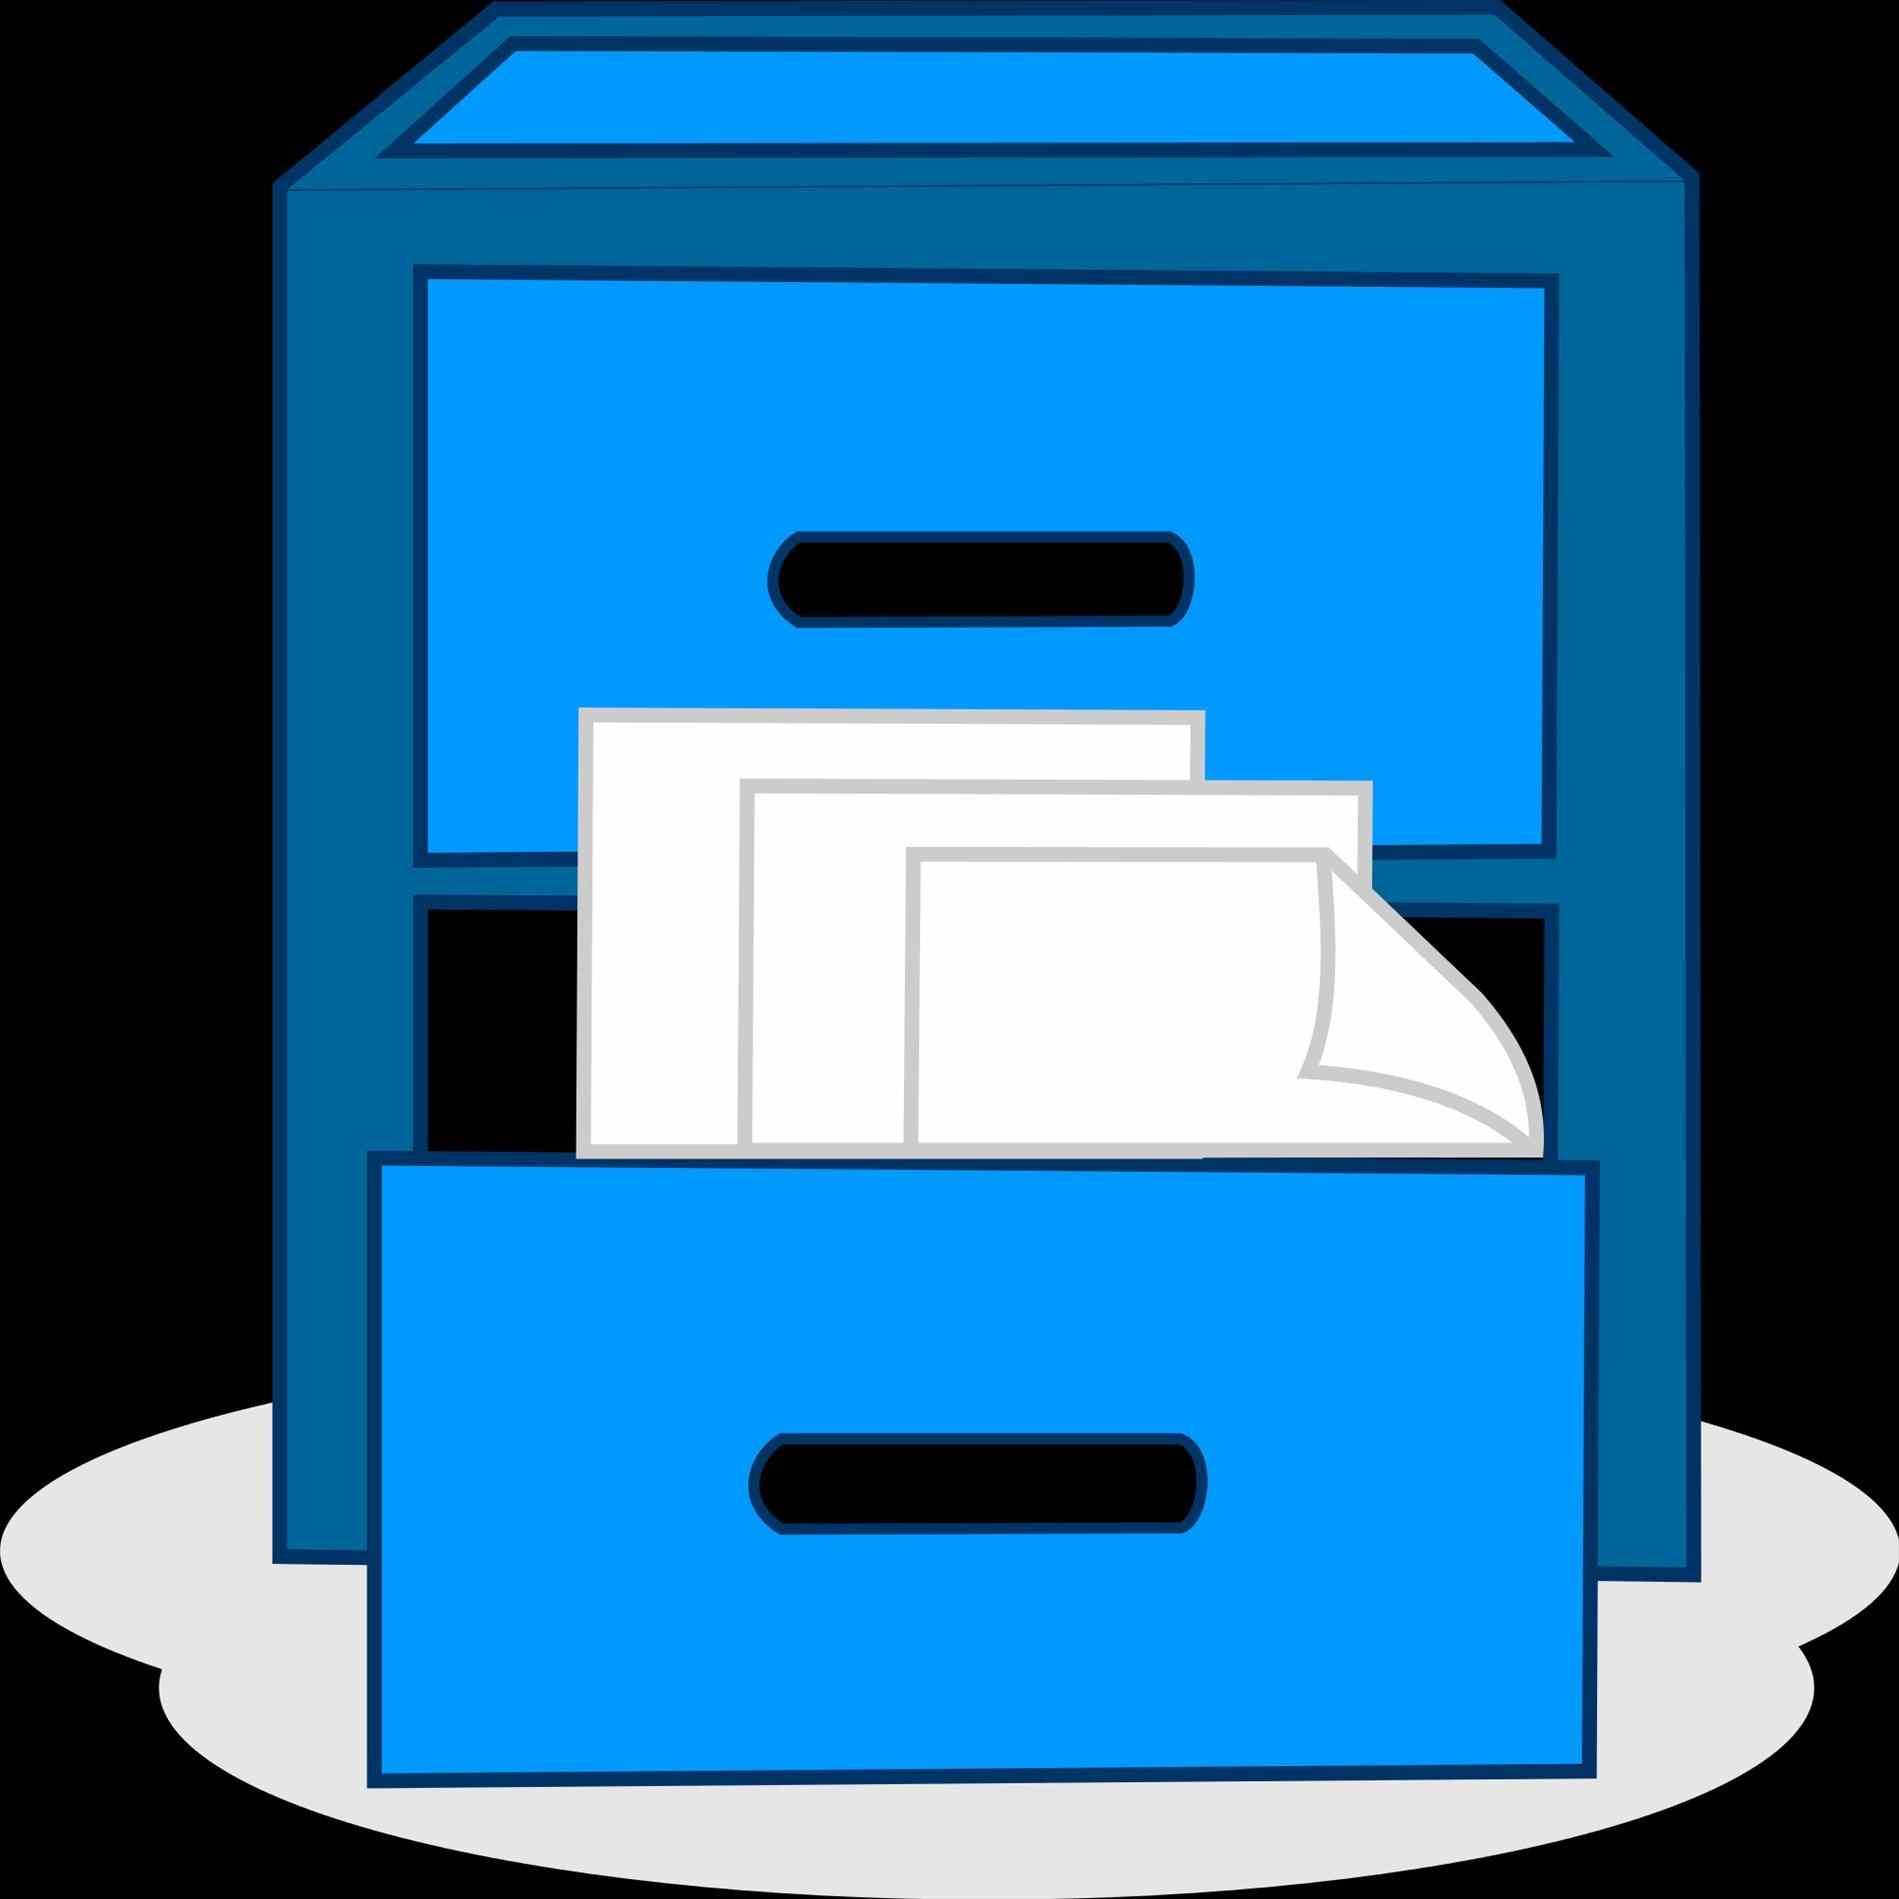 1899x1899 Clip Art U Download File Filing Cabinet Clipart Free